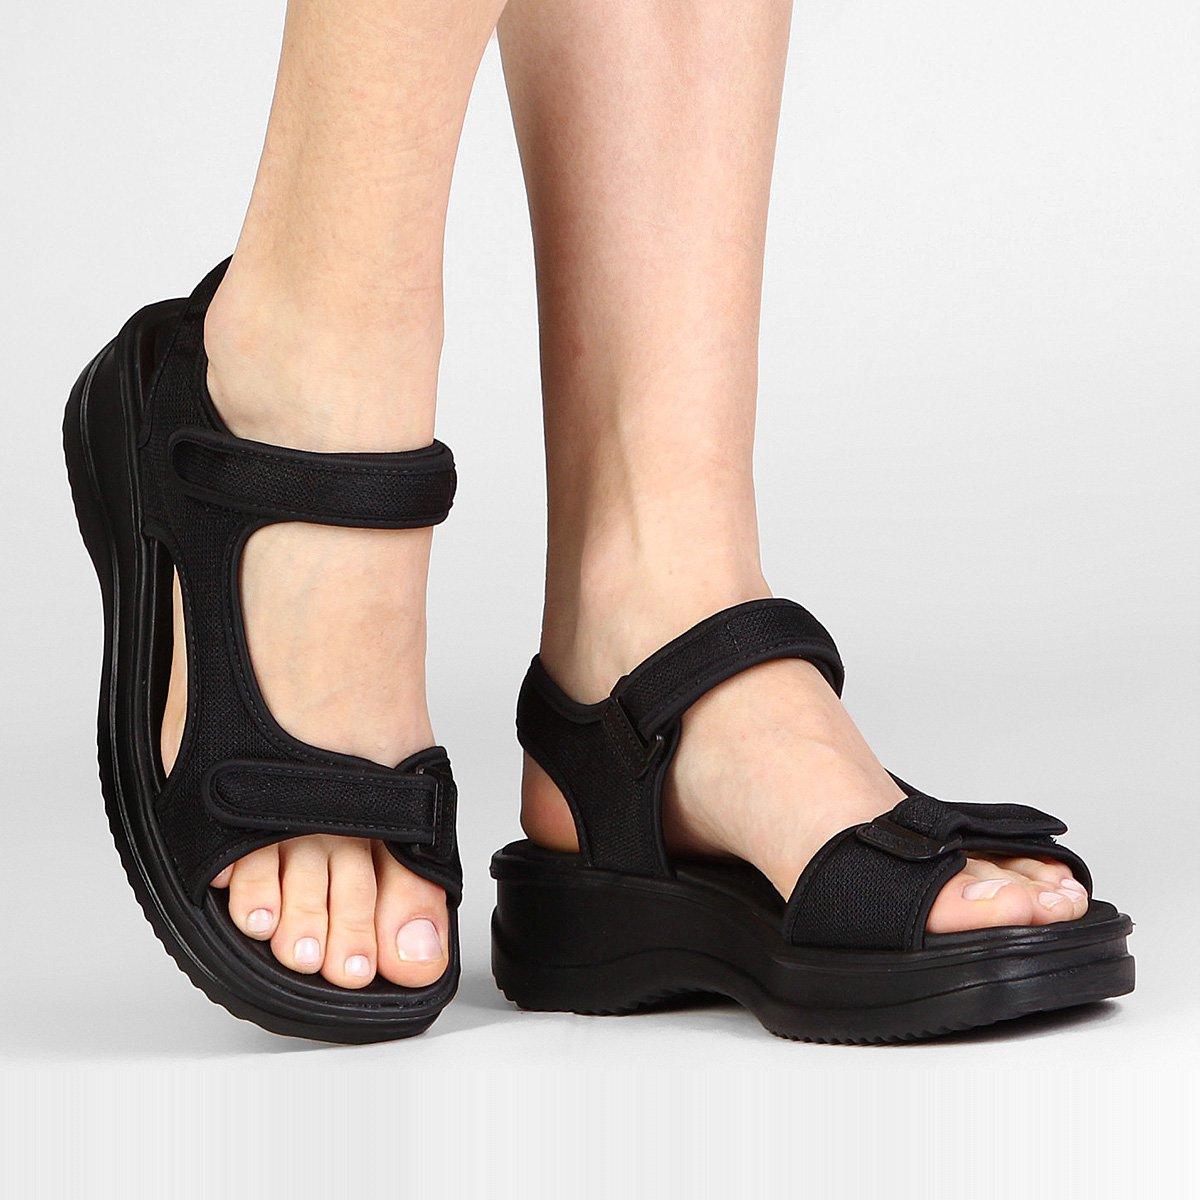 Azaleia VelcroZattini Azaleia Sandália VelcroZattini Sandália Conforto Conforto 8n0OPkw